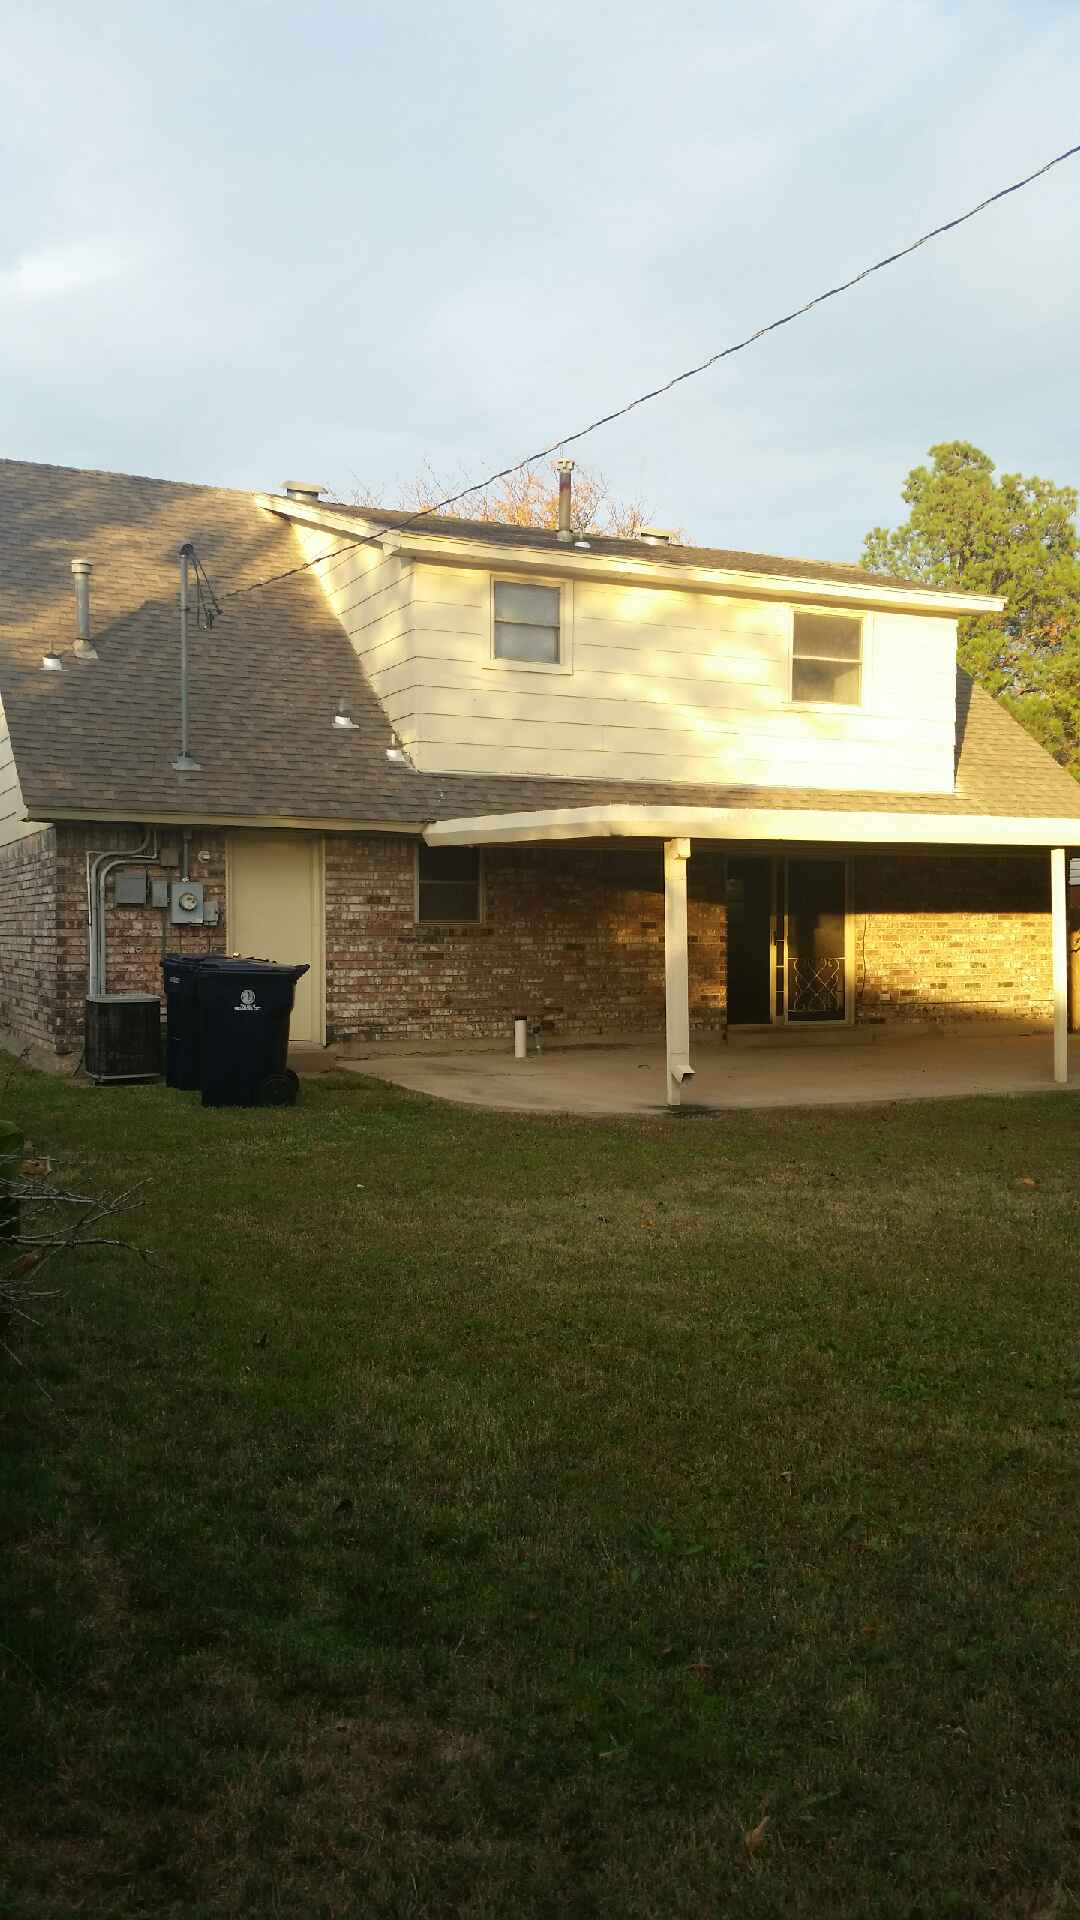 Rent to own homes Oklahoma City Key Properties OKC Sells Houses